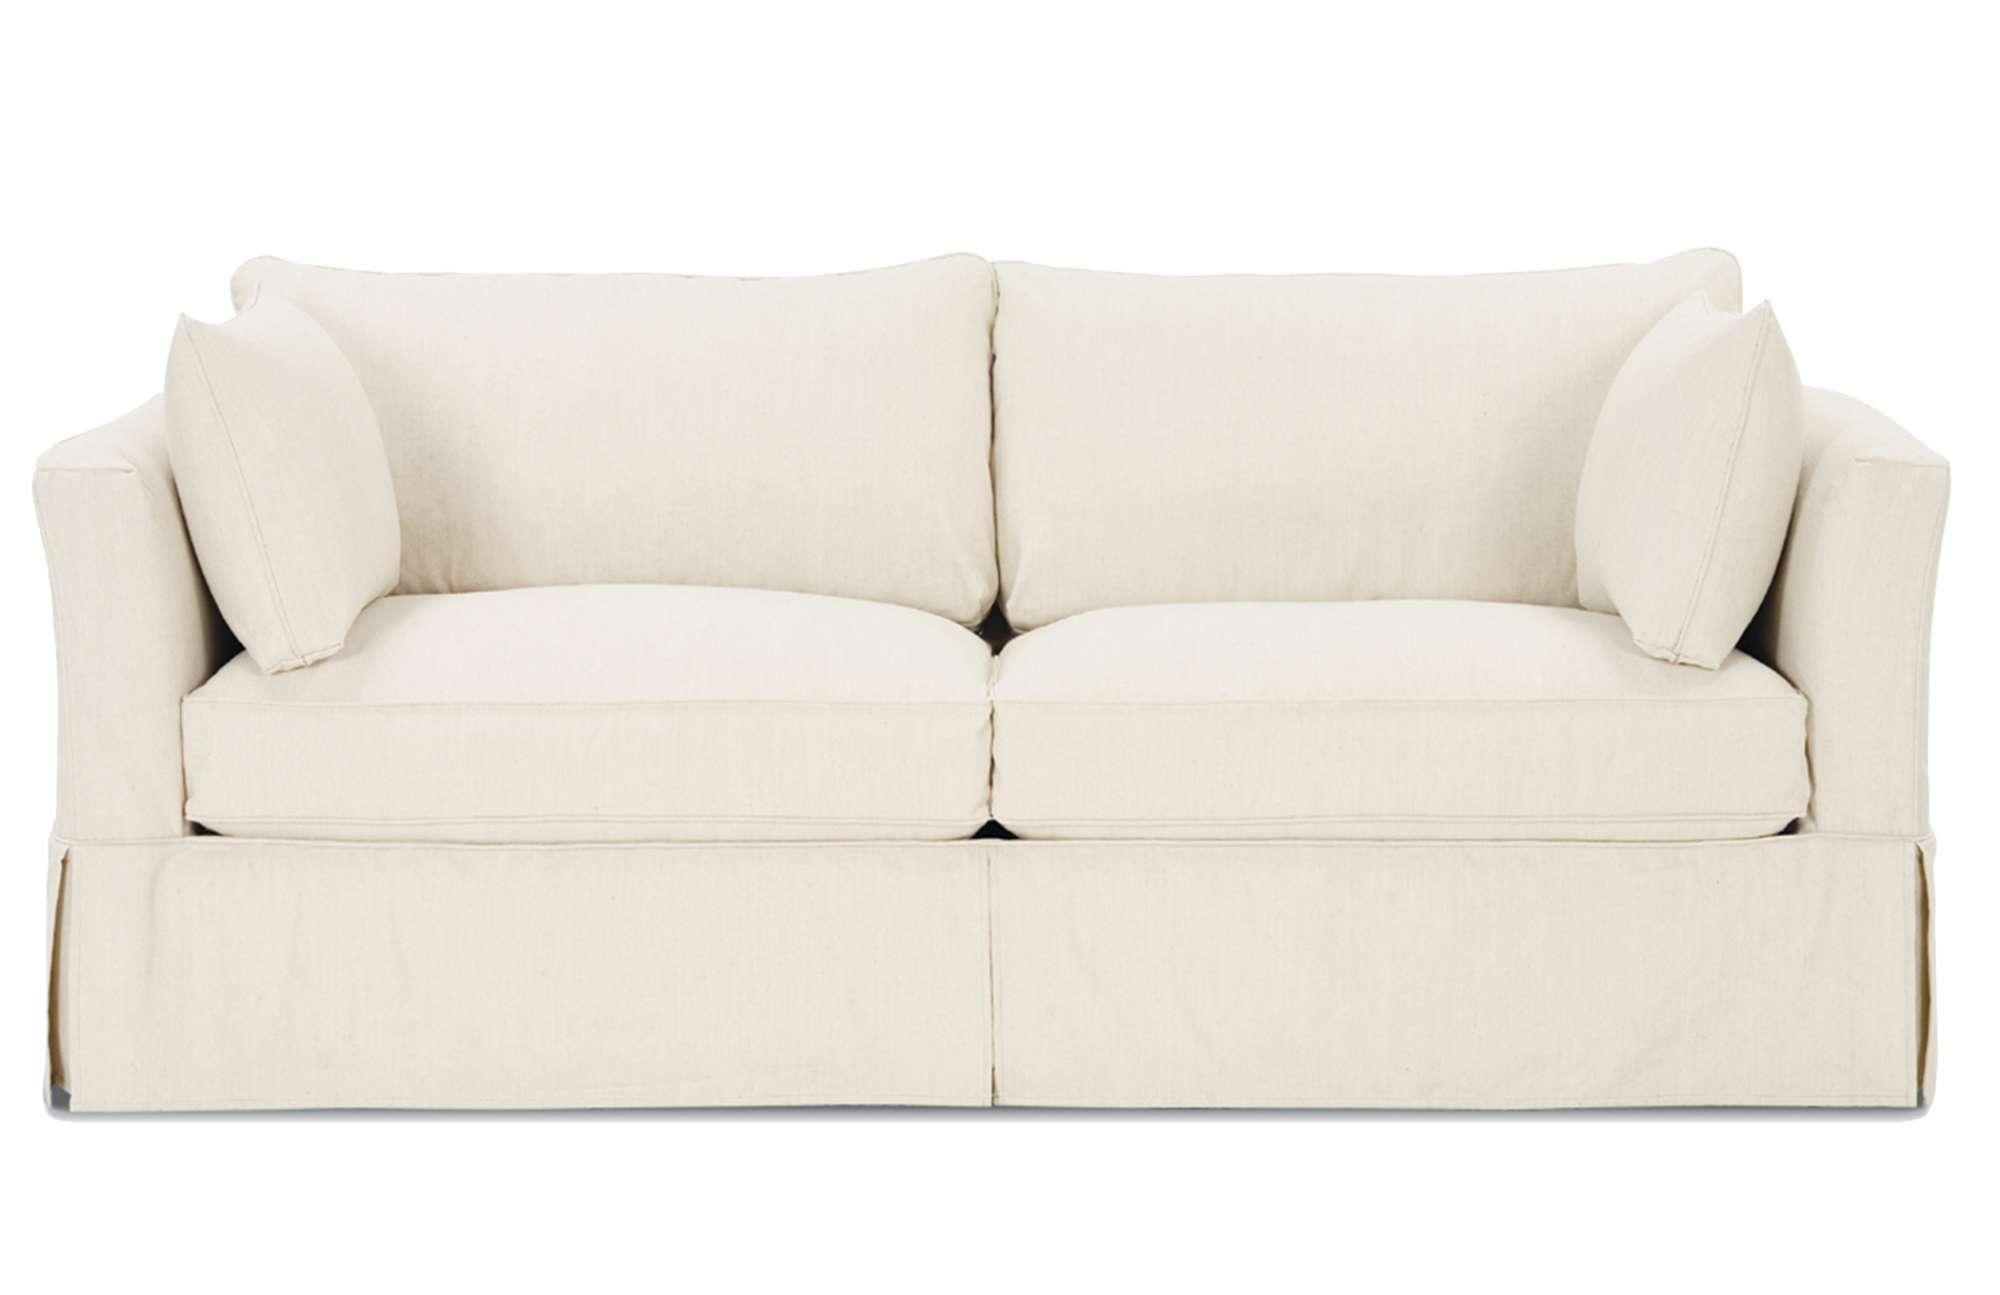 sofa sleeper cover teal throw 20 43 choices of slipcovers ideas